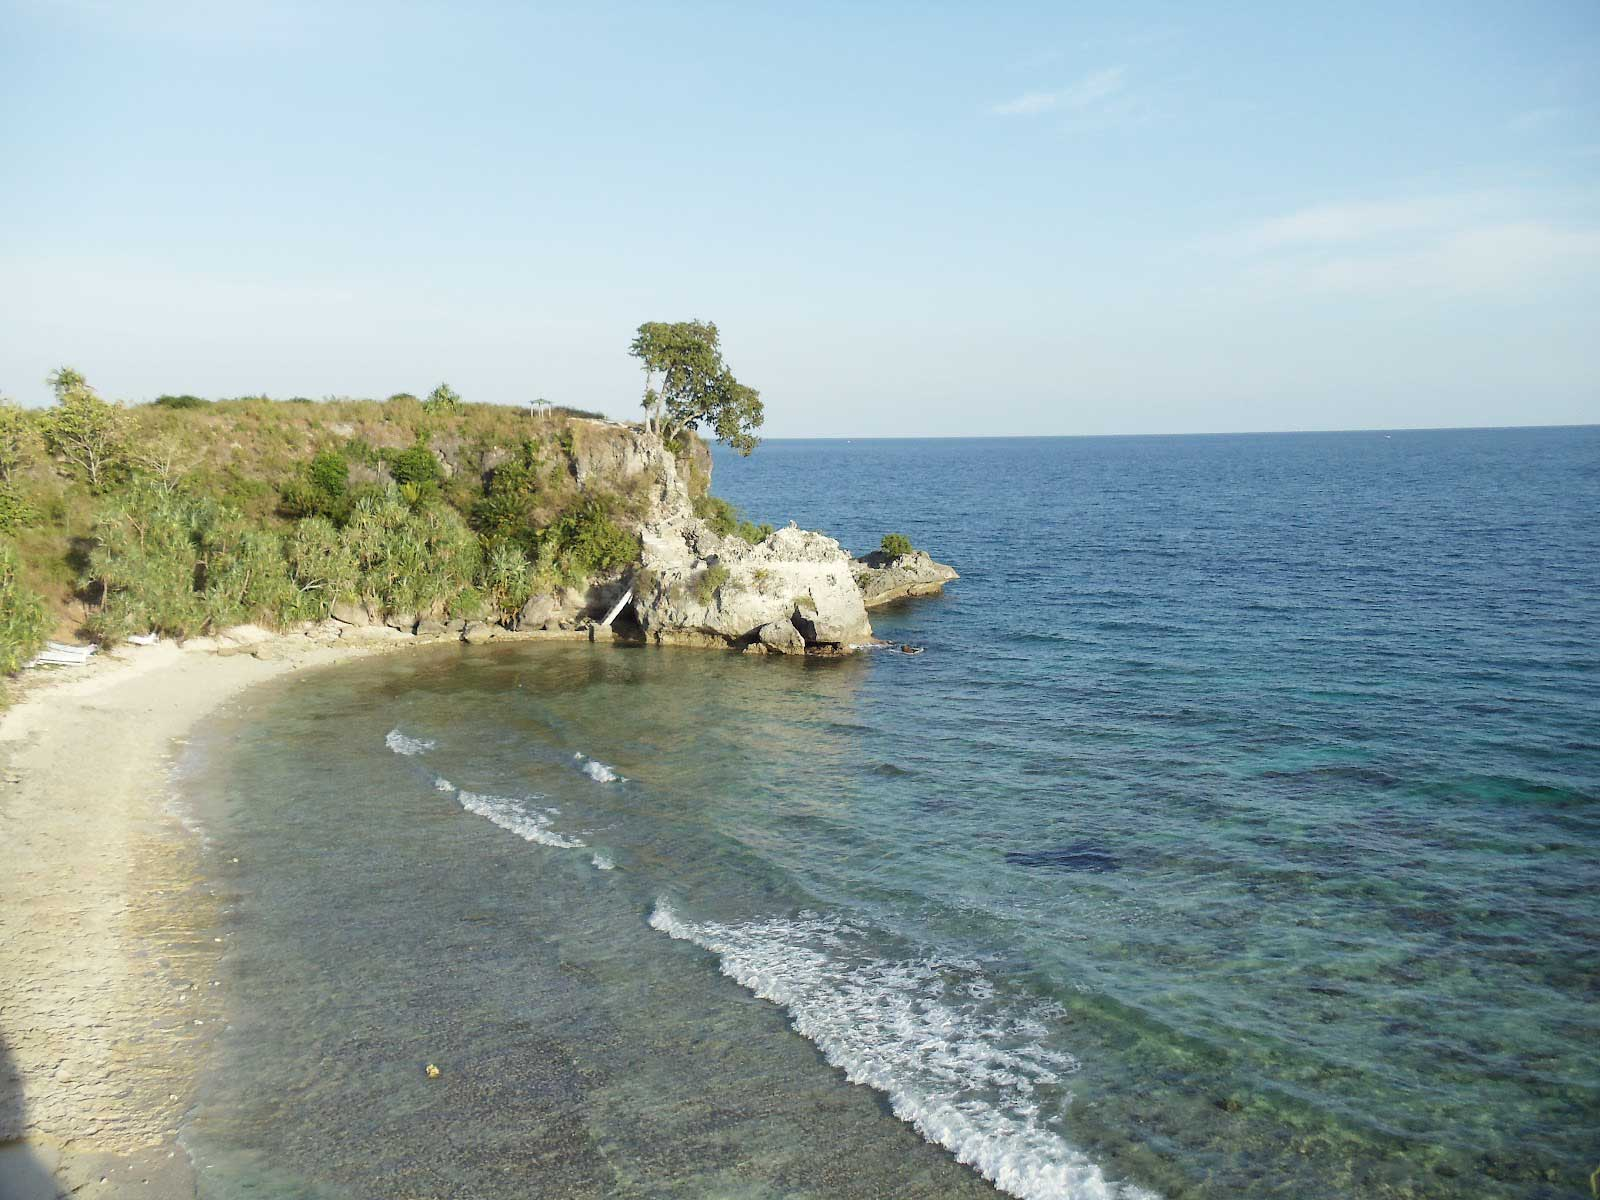 Pantai Dato Majene Sulawesi Barat